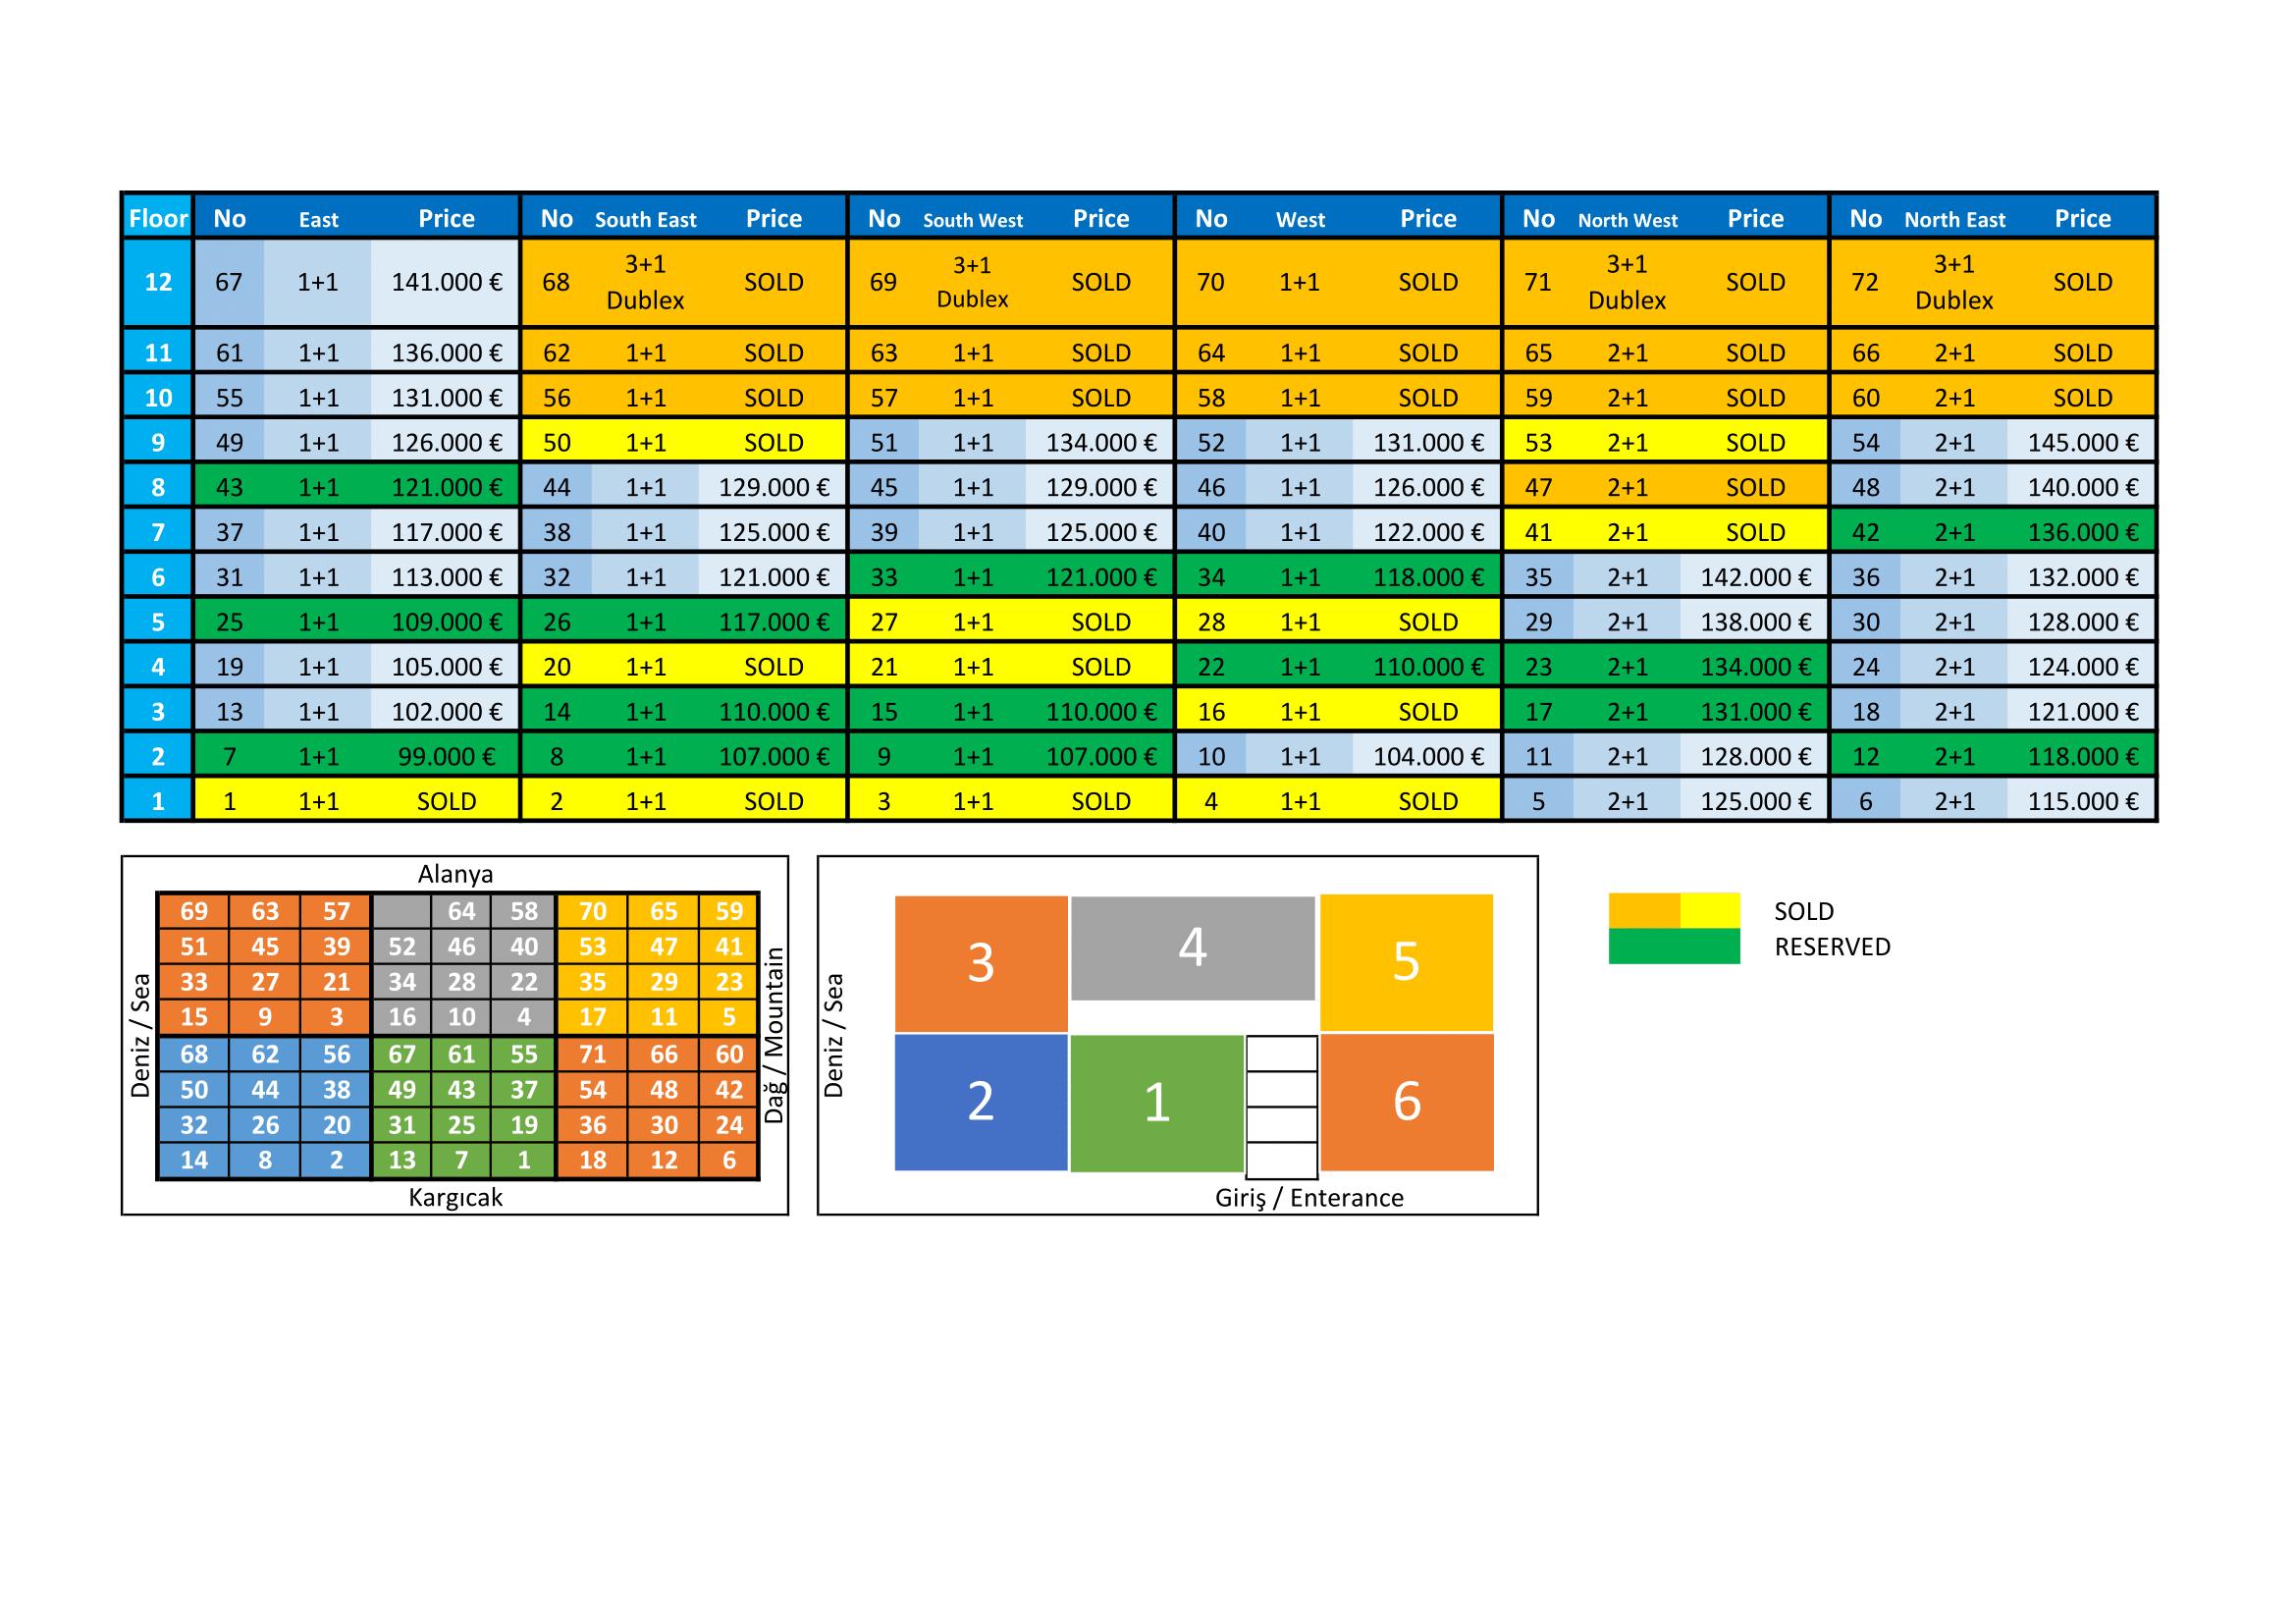 p017-price-list-12-11-2018-1